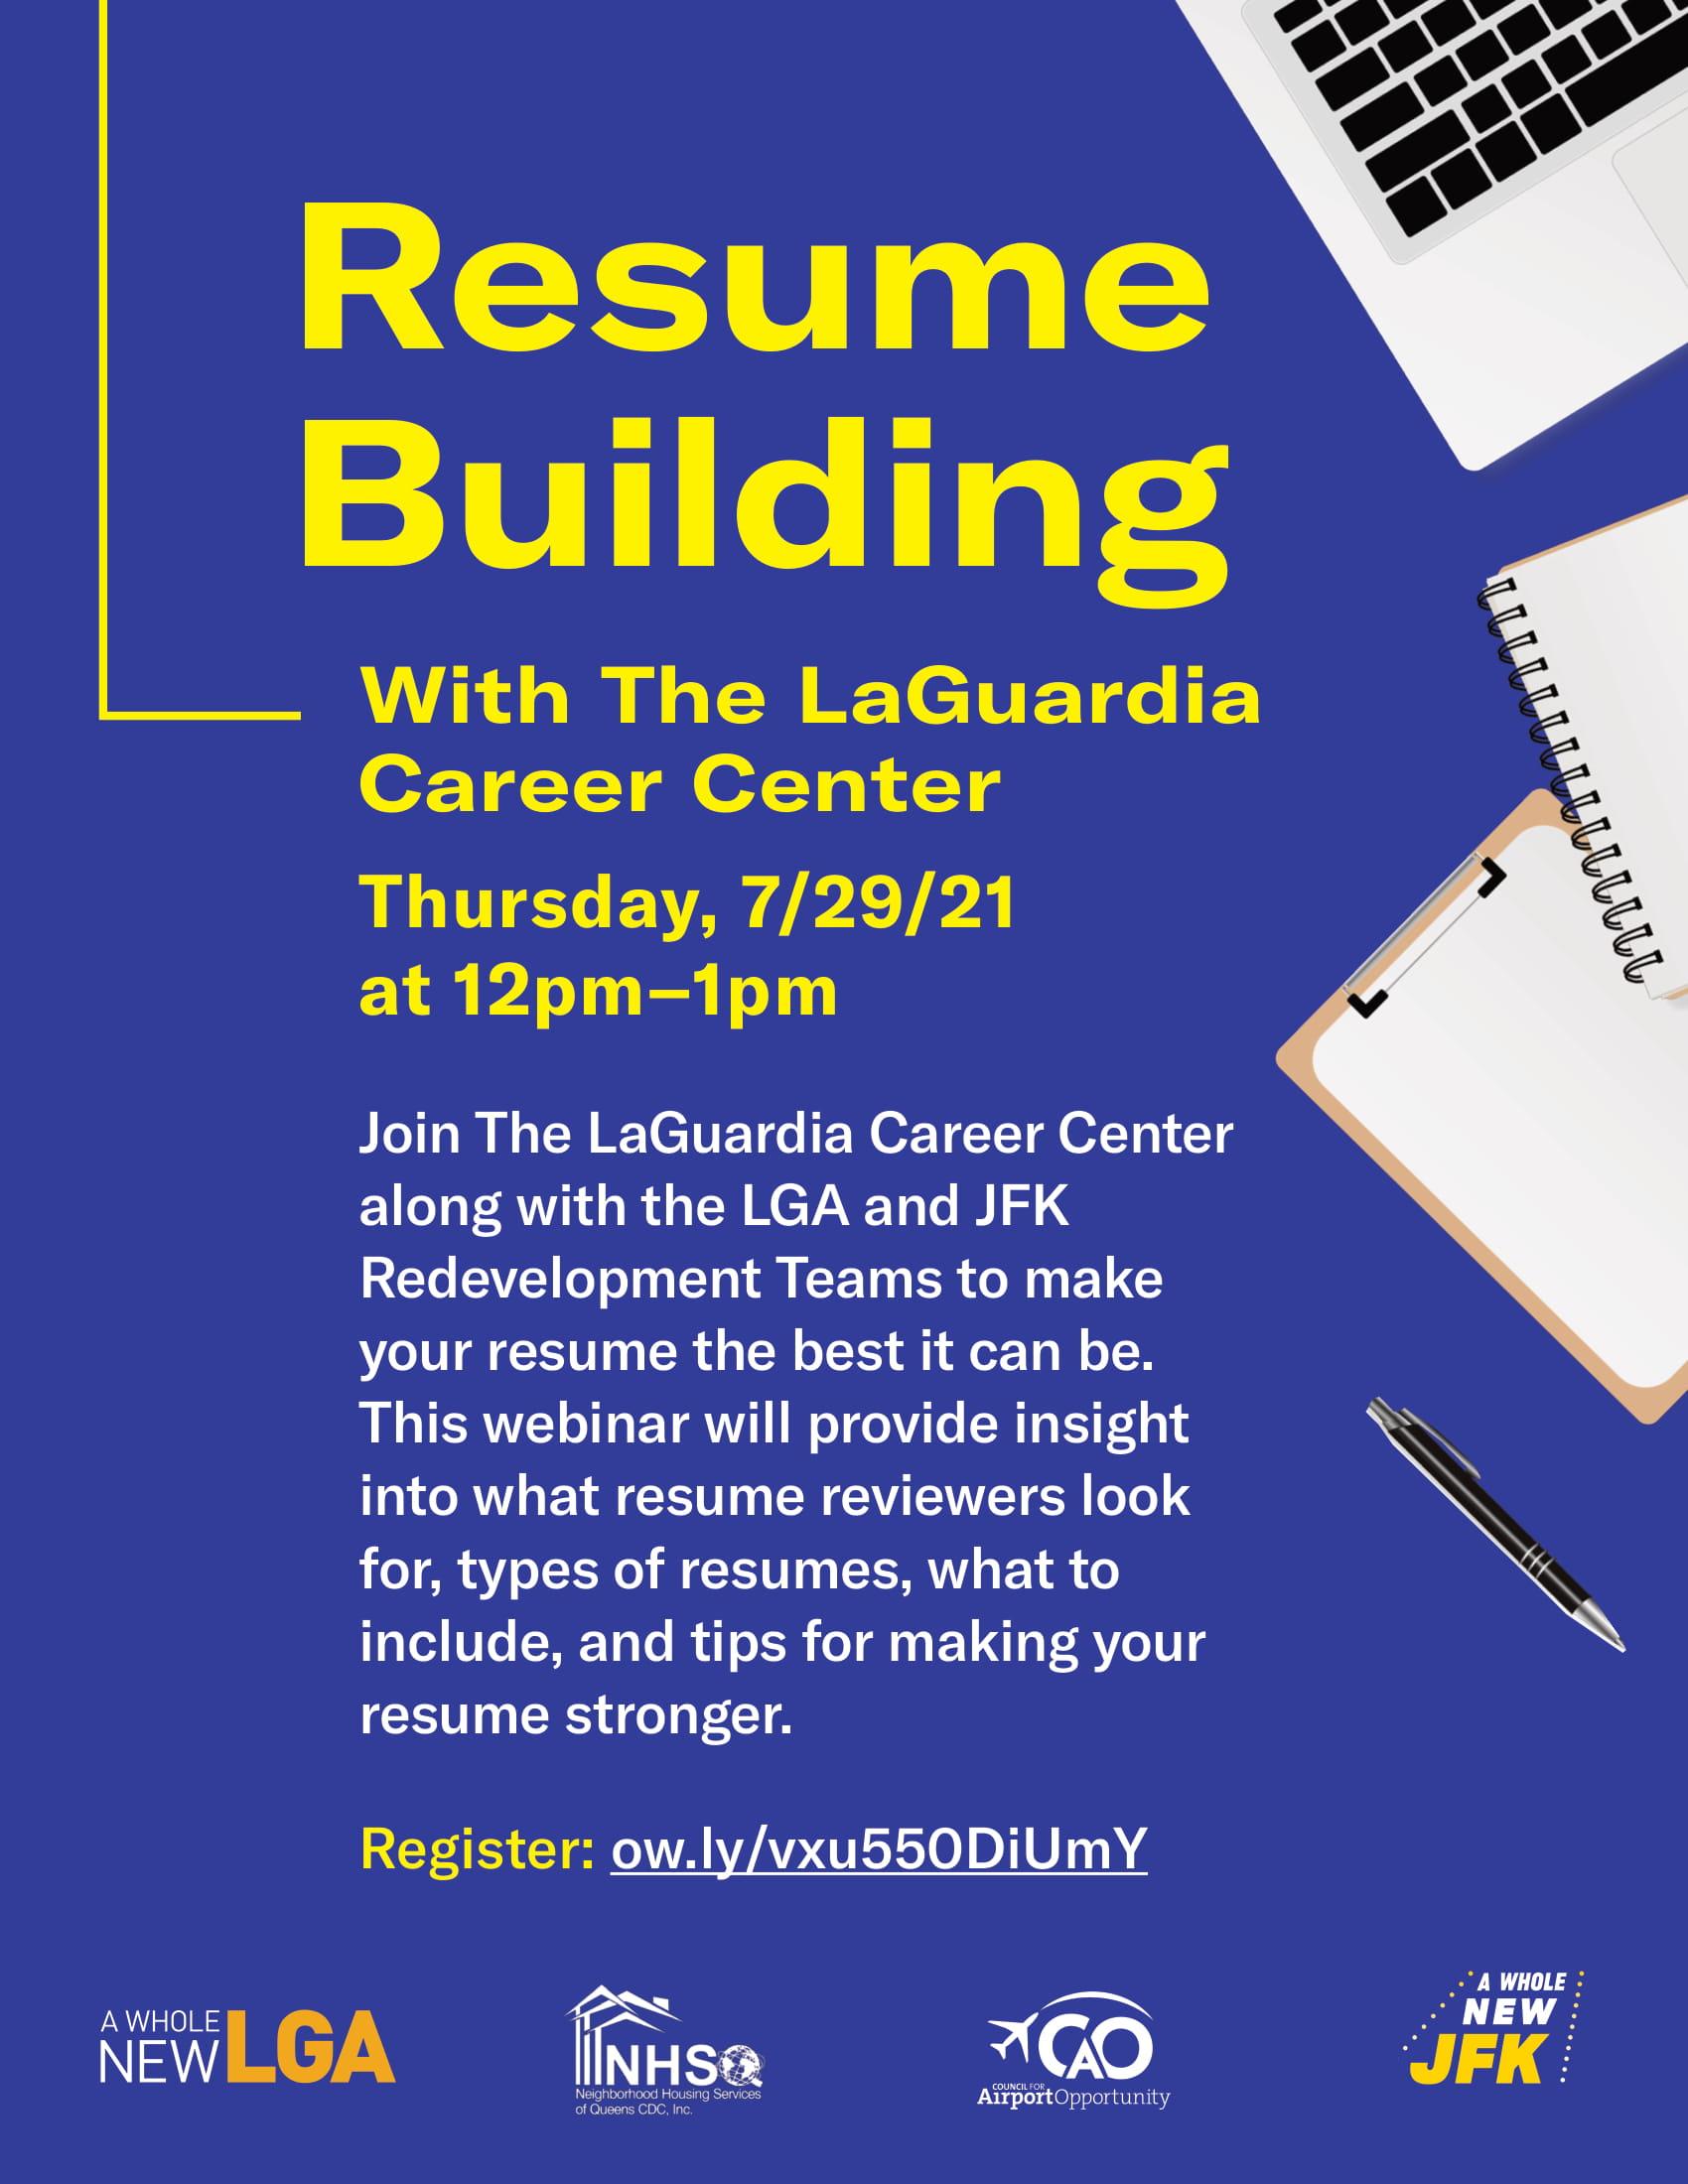 Resume Building Webinar